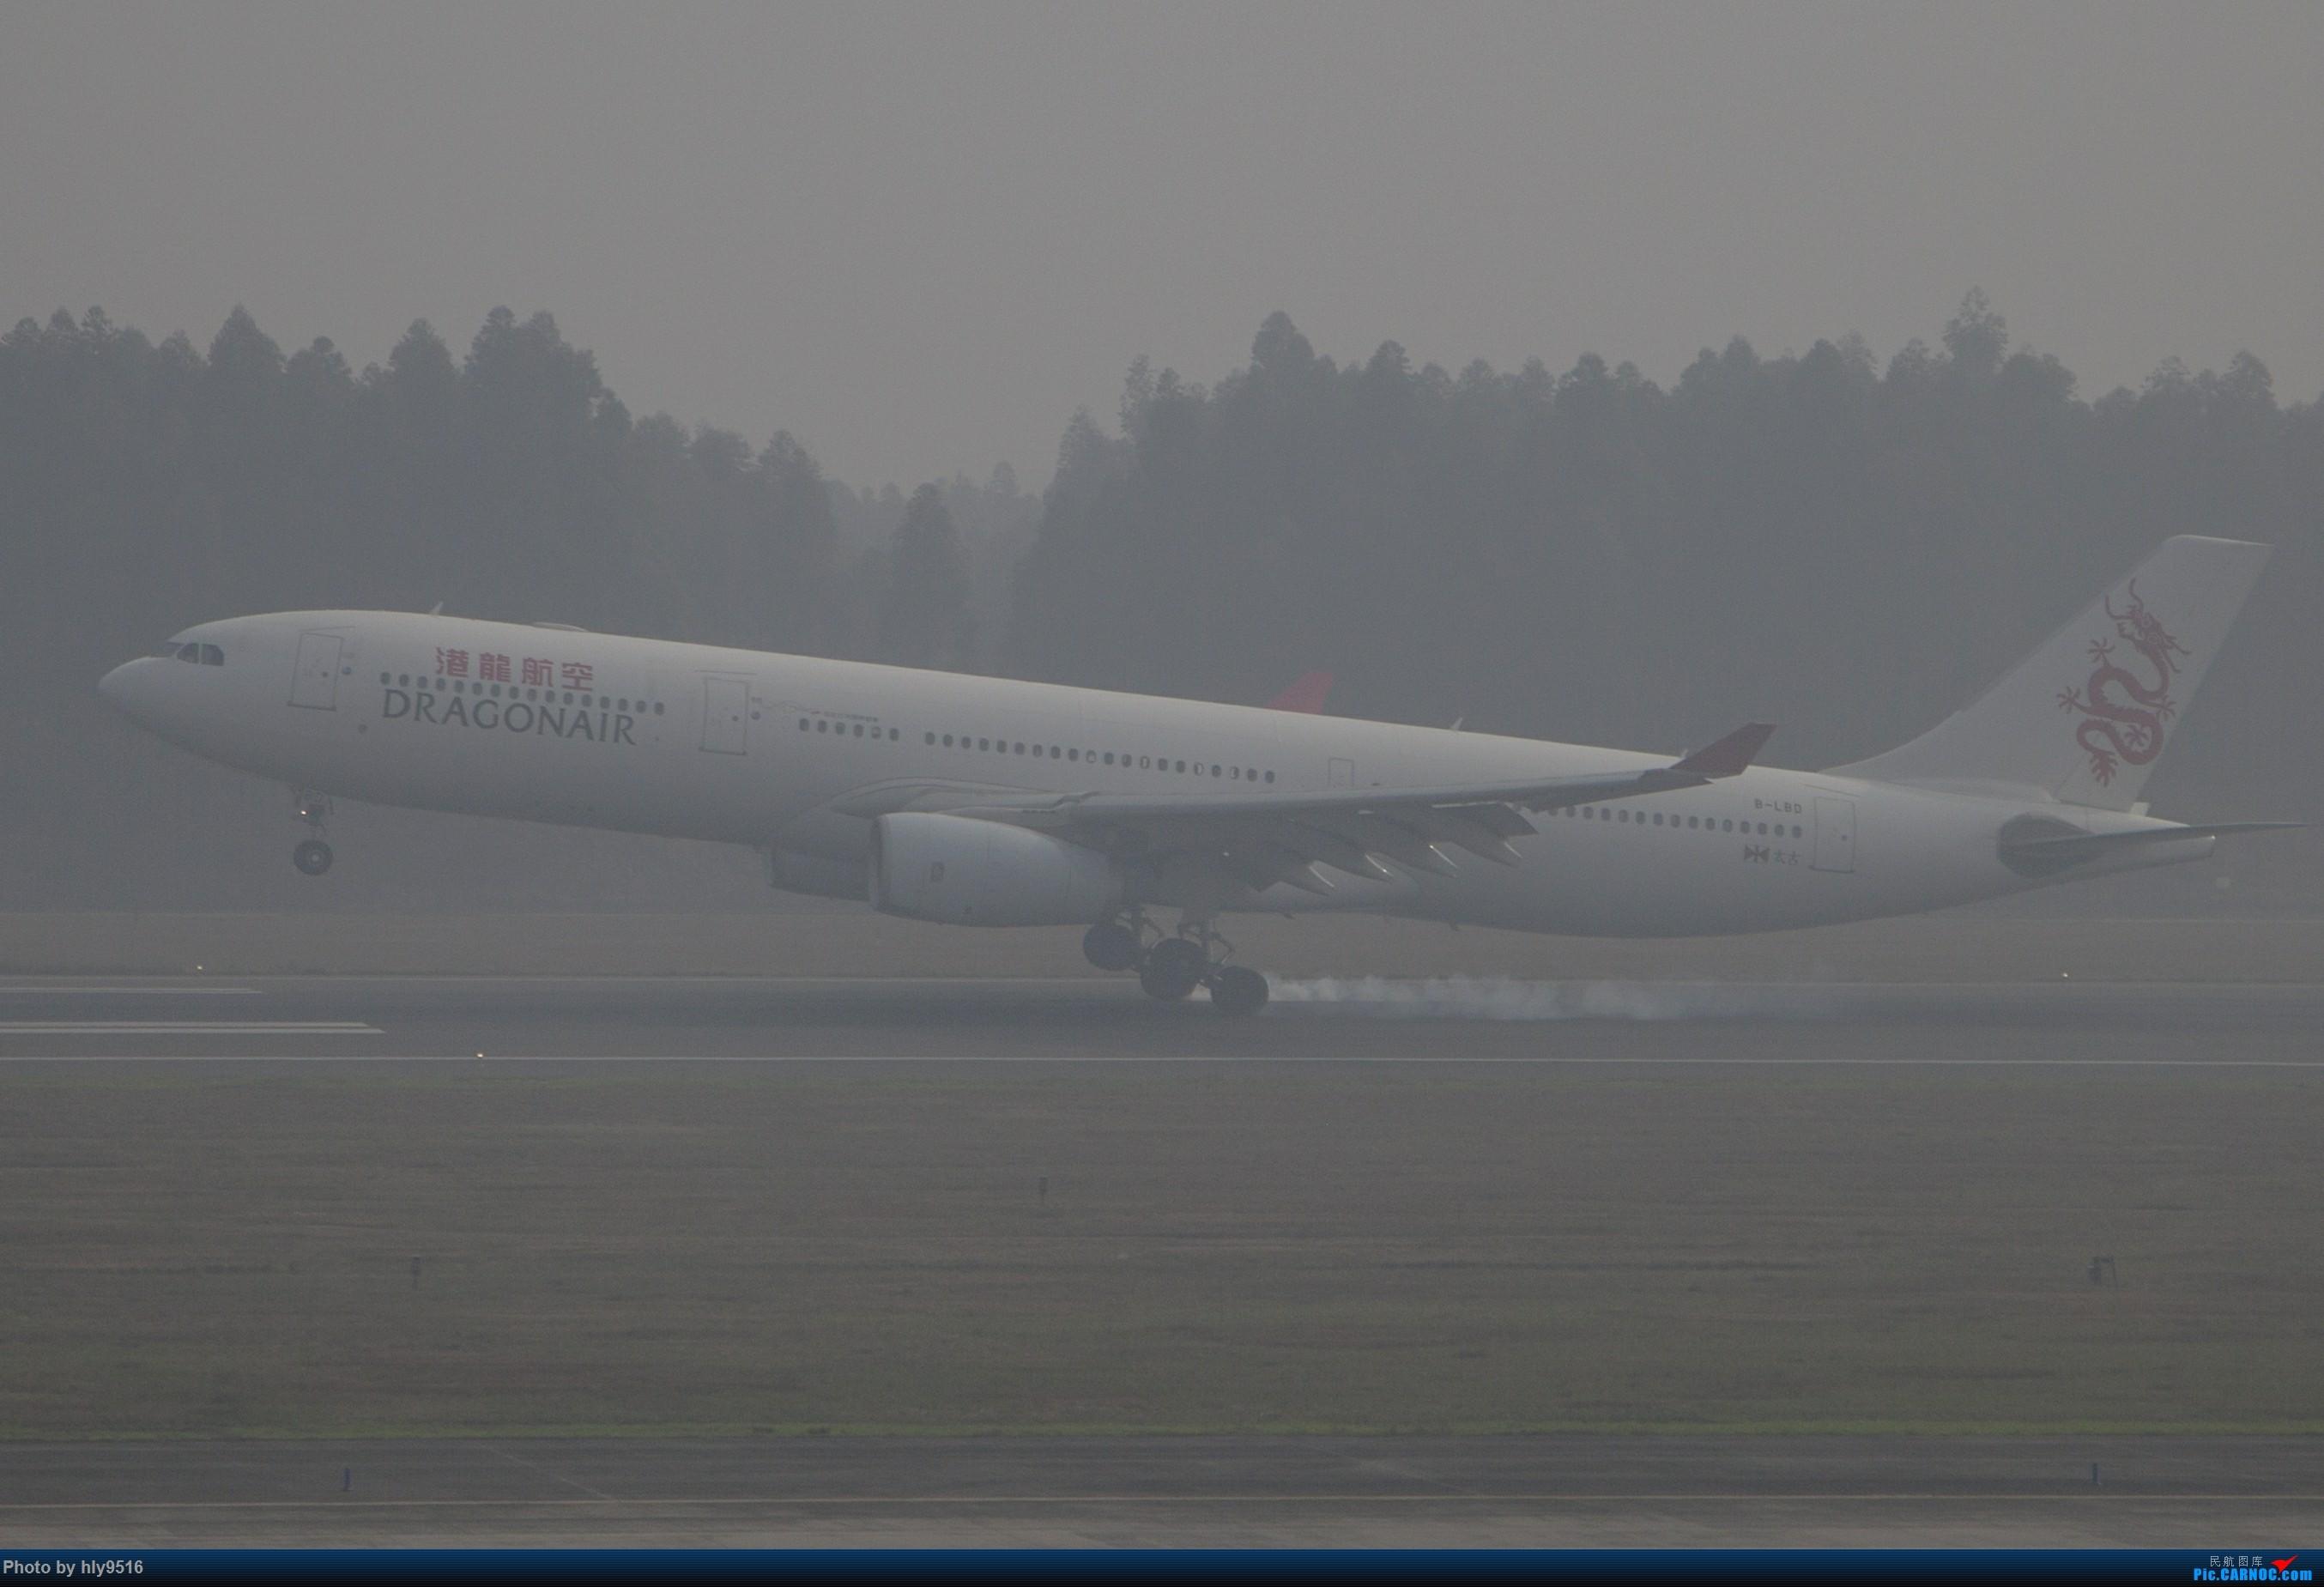 Re:[原创]【CTU】去年冬天老图一组,论成都的极致雾霾烂天 AIRBUS A330-300 B-LBD 中国成都双流国际机场